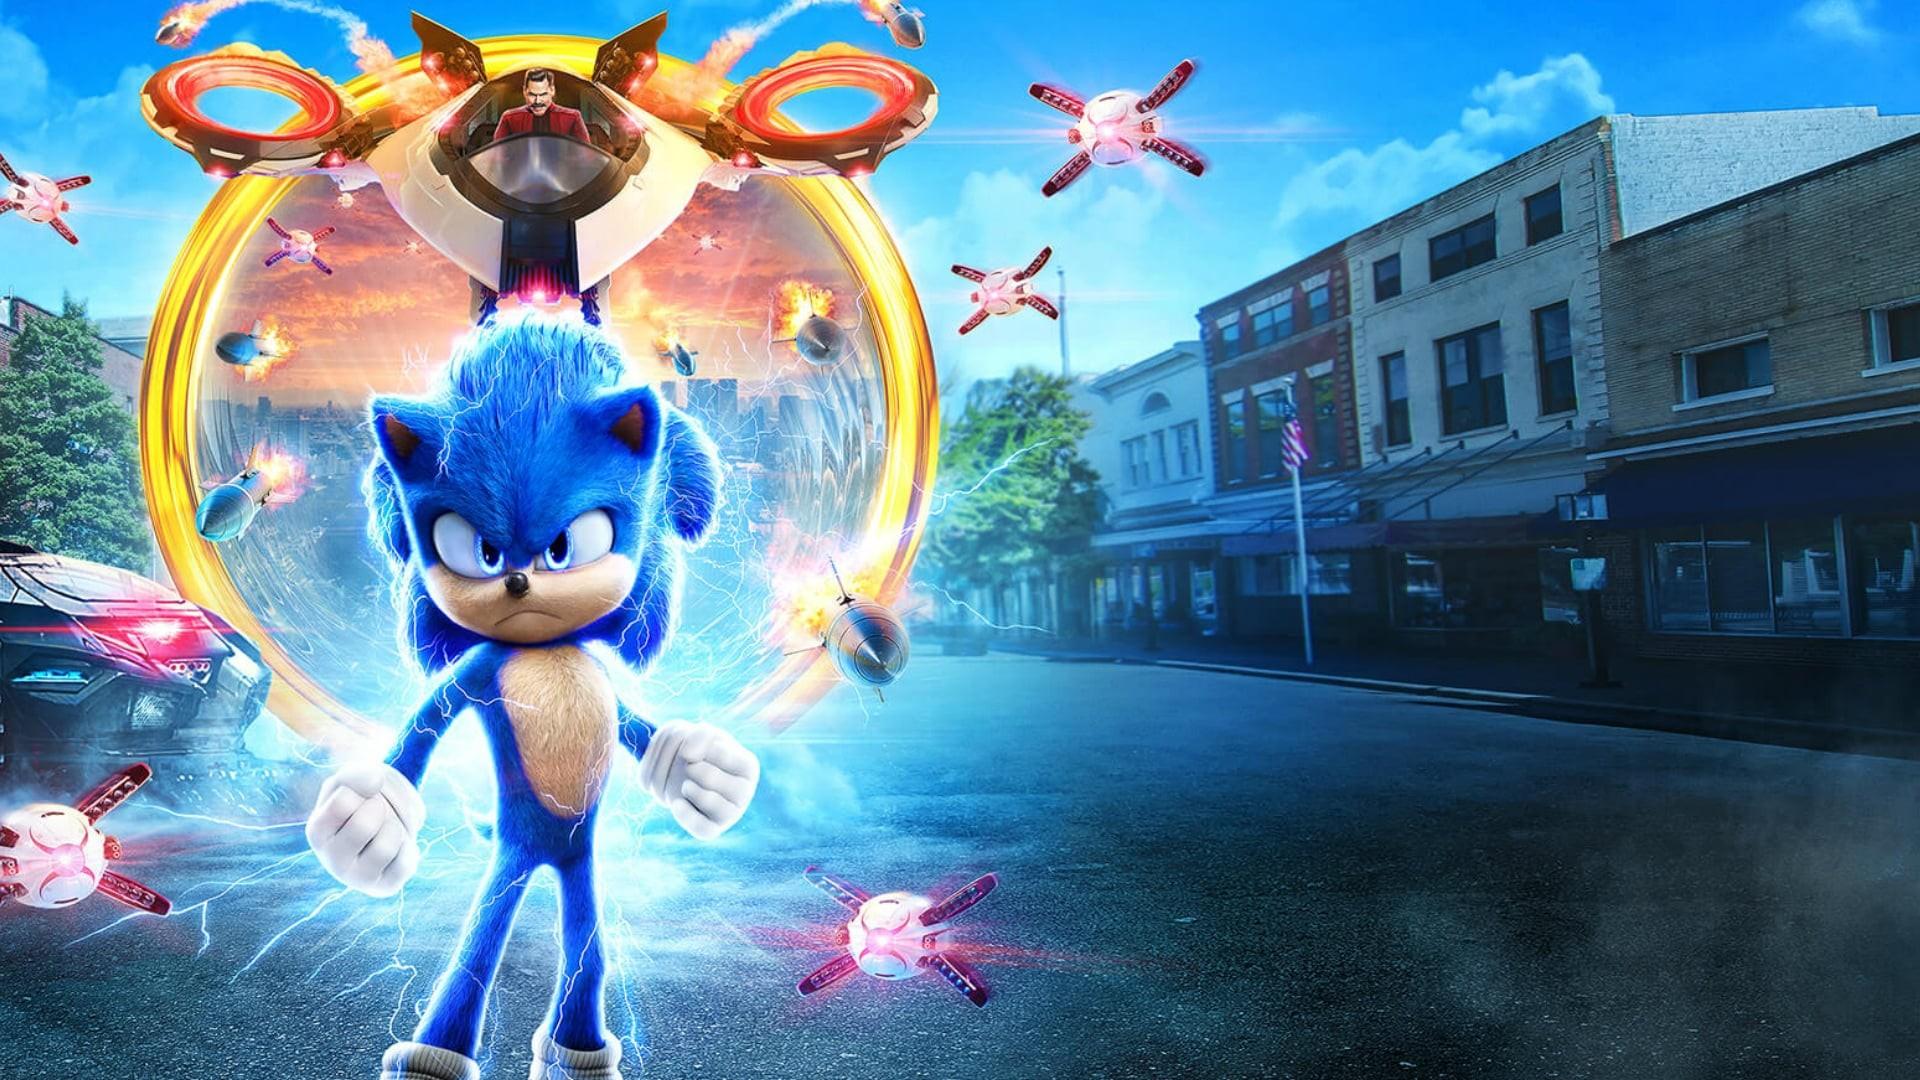 Watch Sonic The Hedgehog 2020 Full Movie Download Hd Teletype